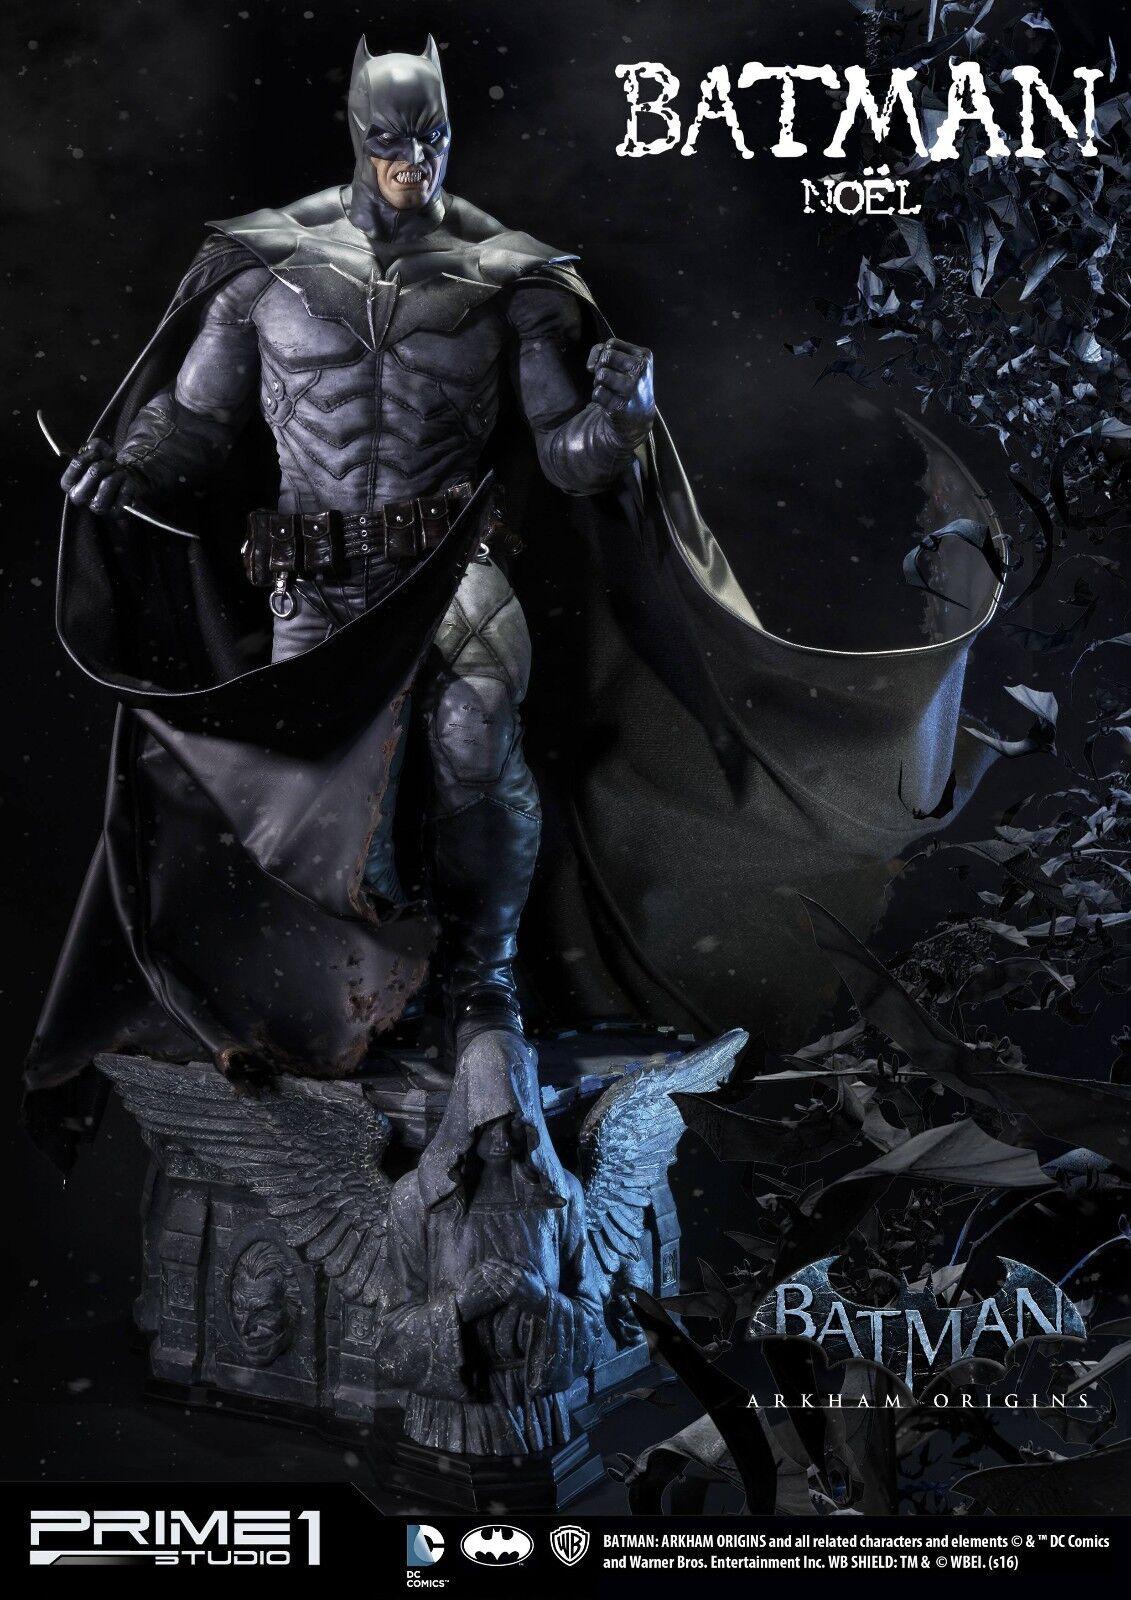 Prime1 Studios Batman Arkham Origins 1/3 Statue Statue Statue Batman Noel Exclusive Ver. 76 cm 5e314c